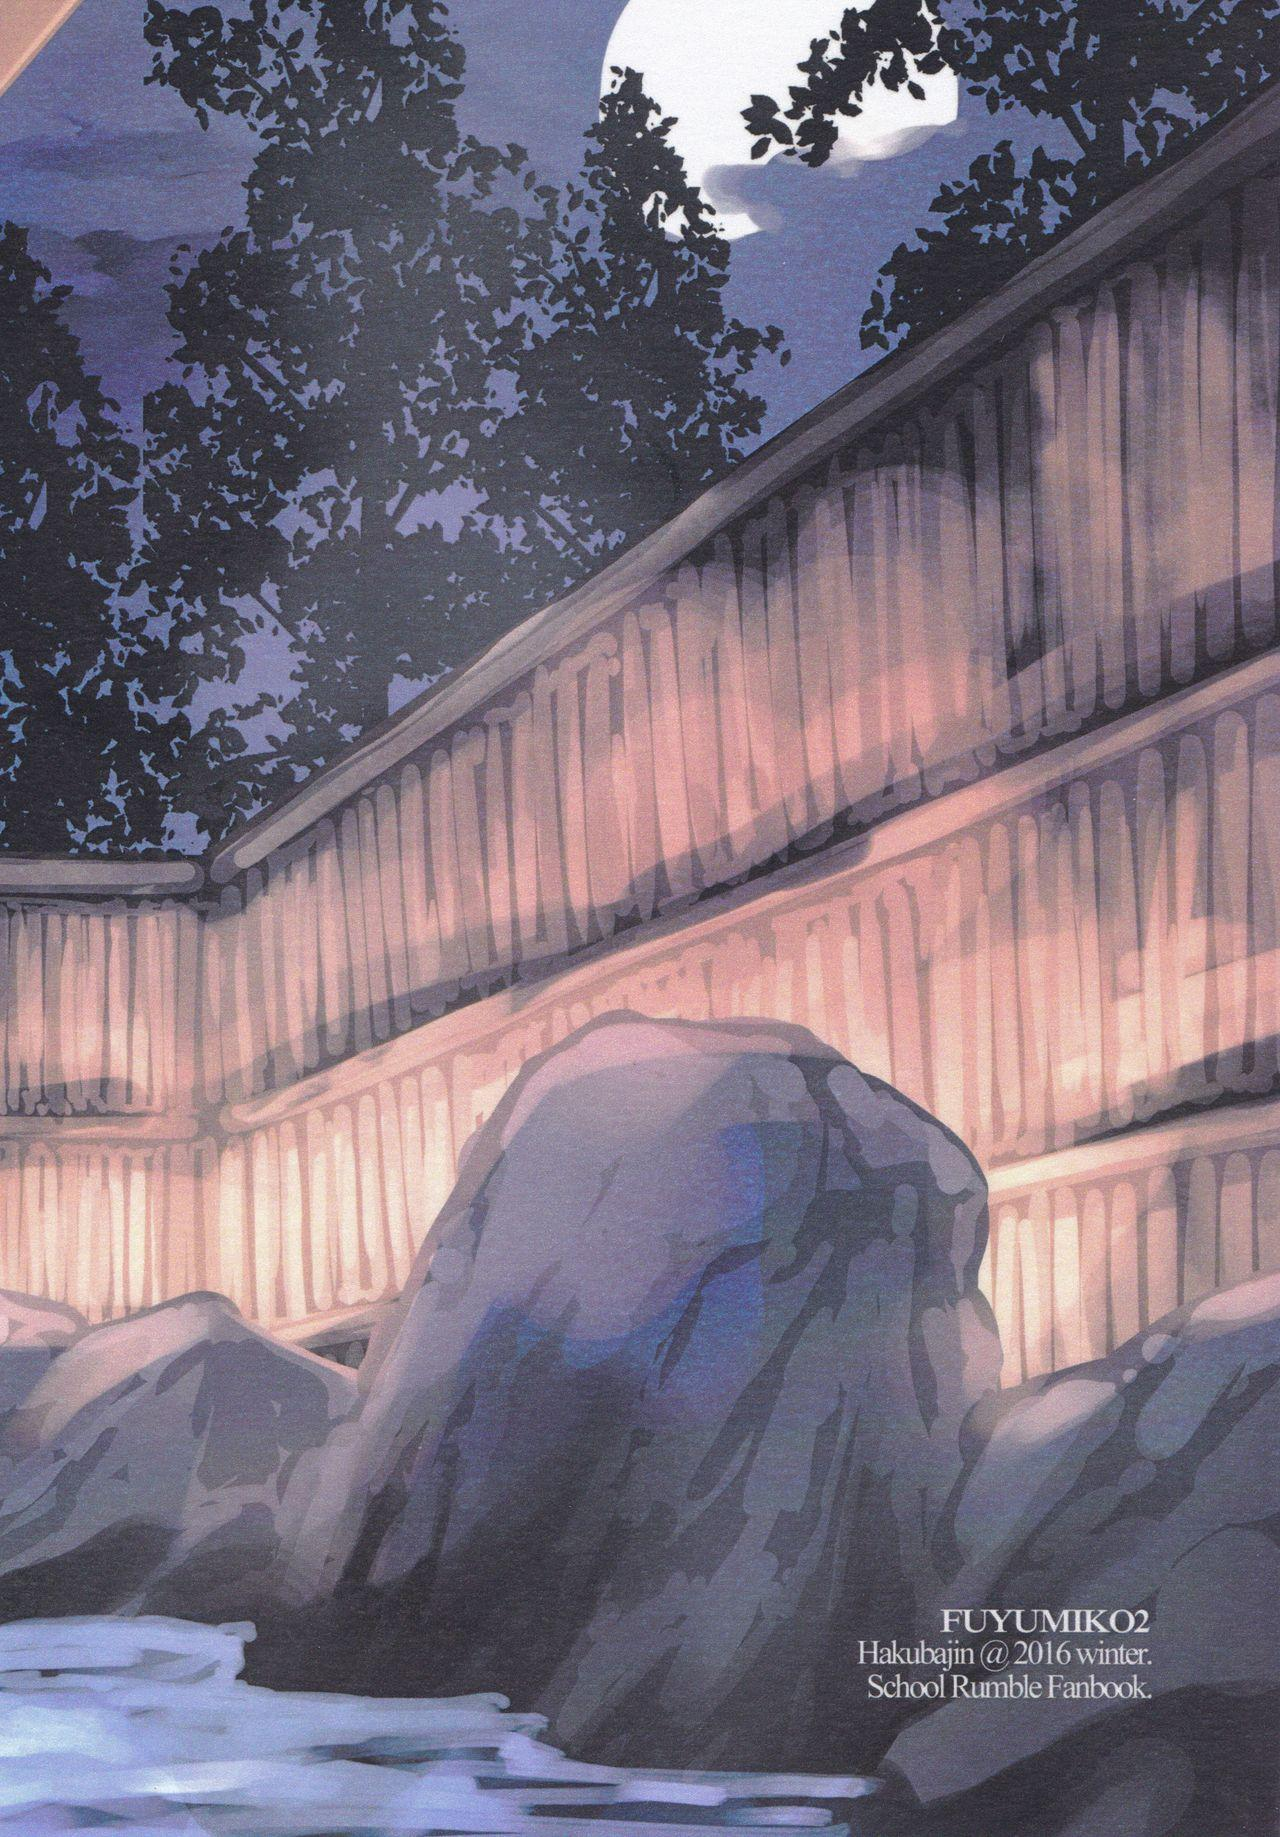 Fuyumiko 2 17